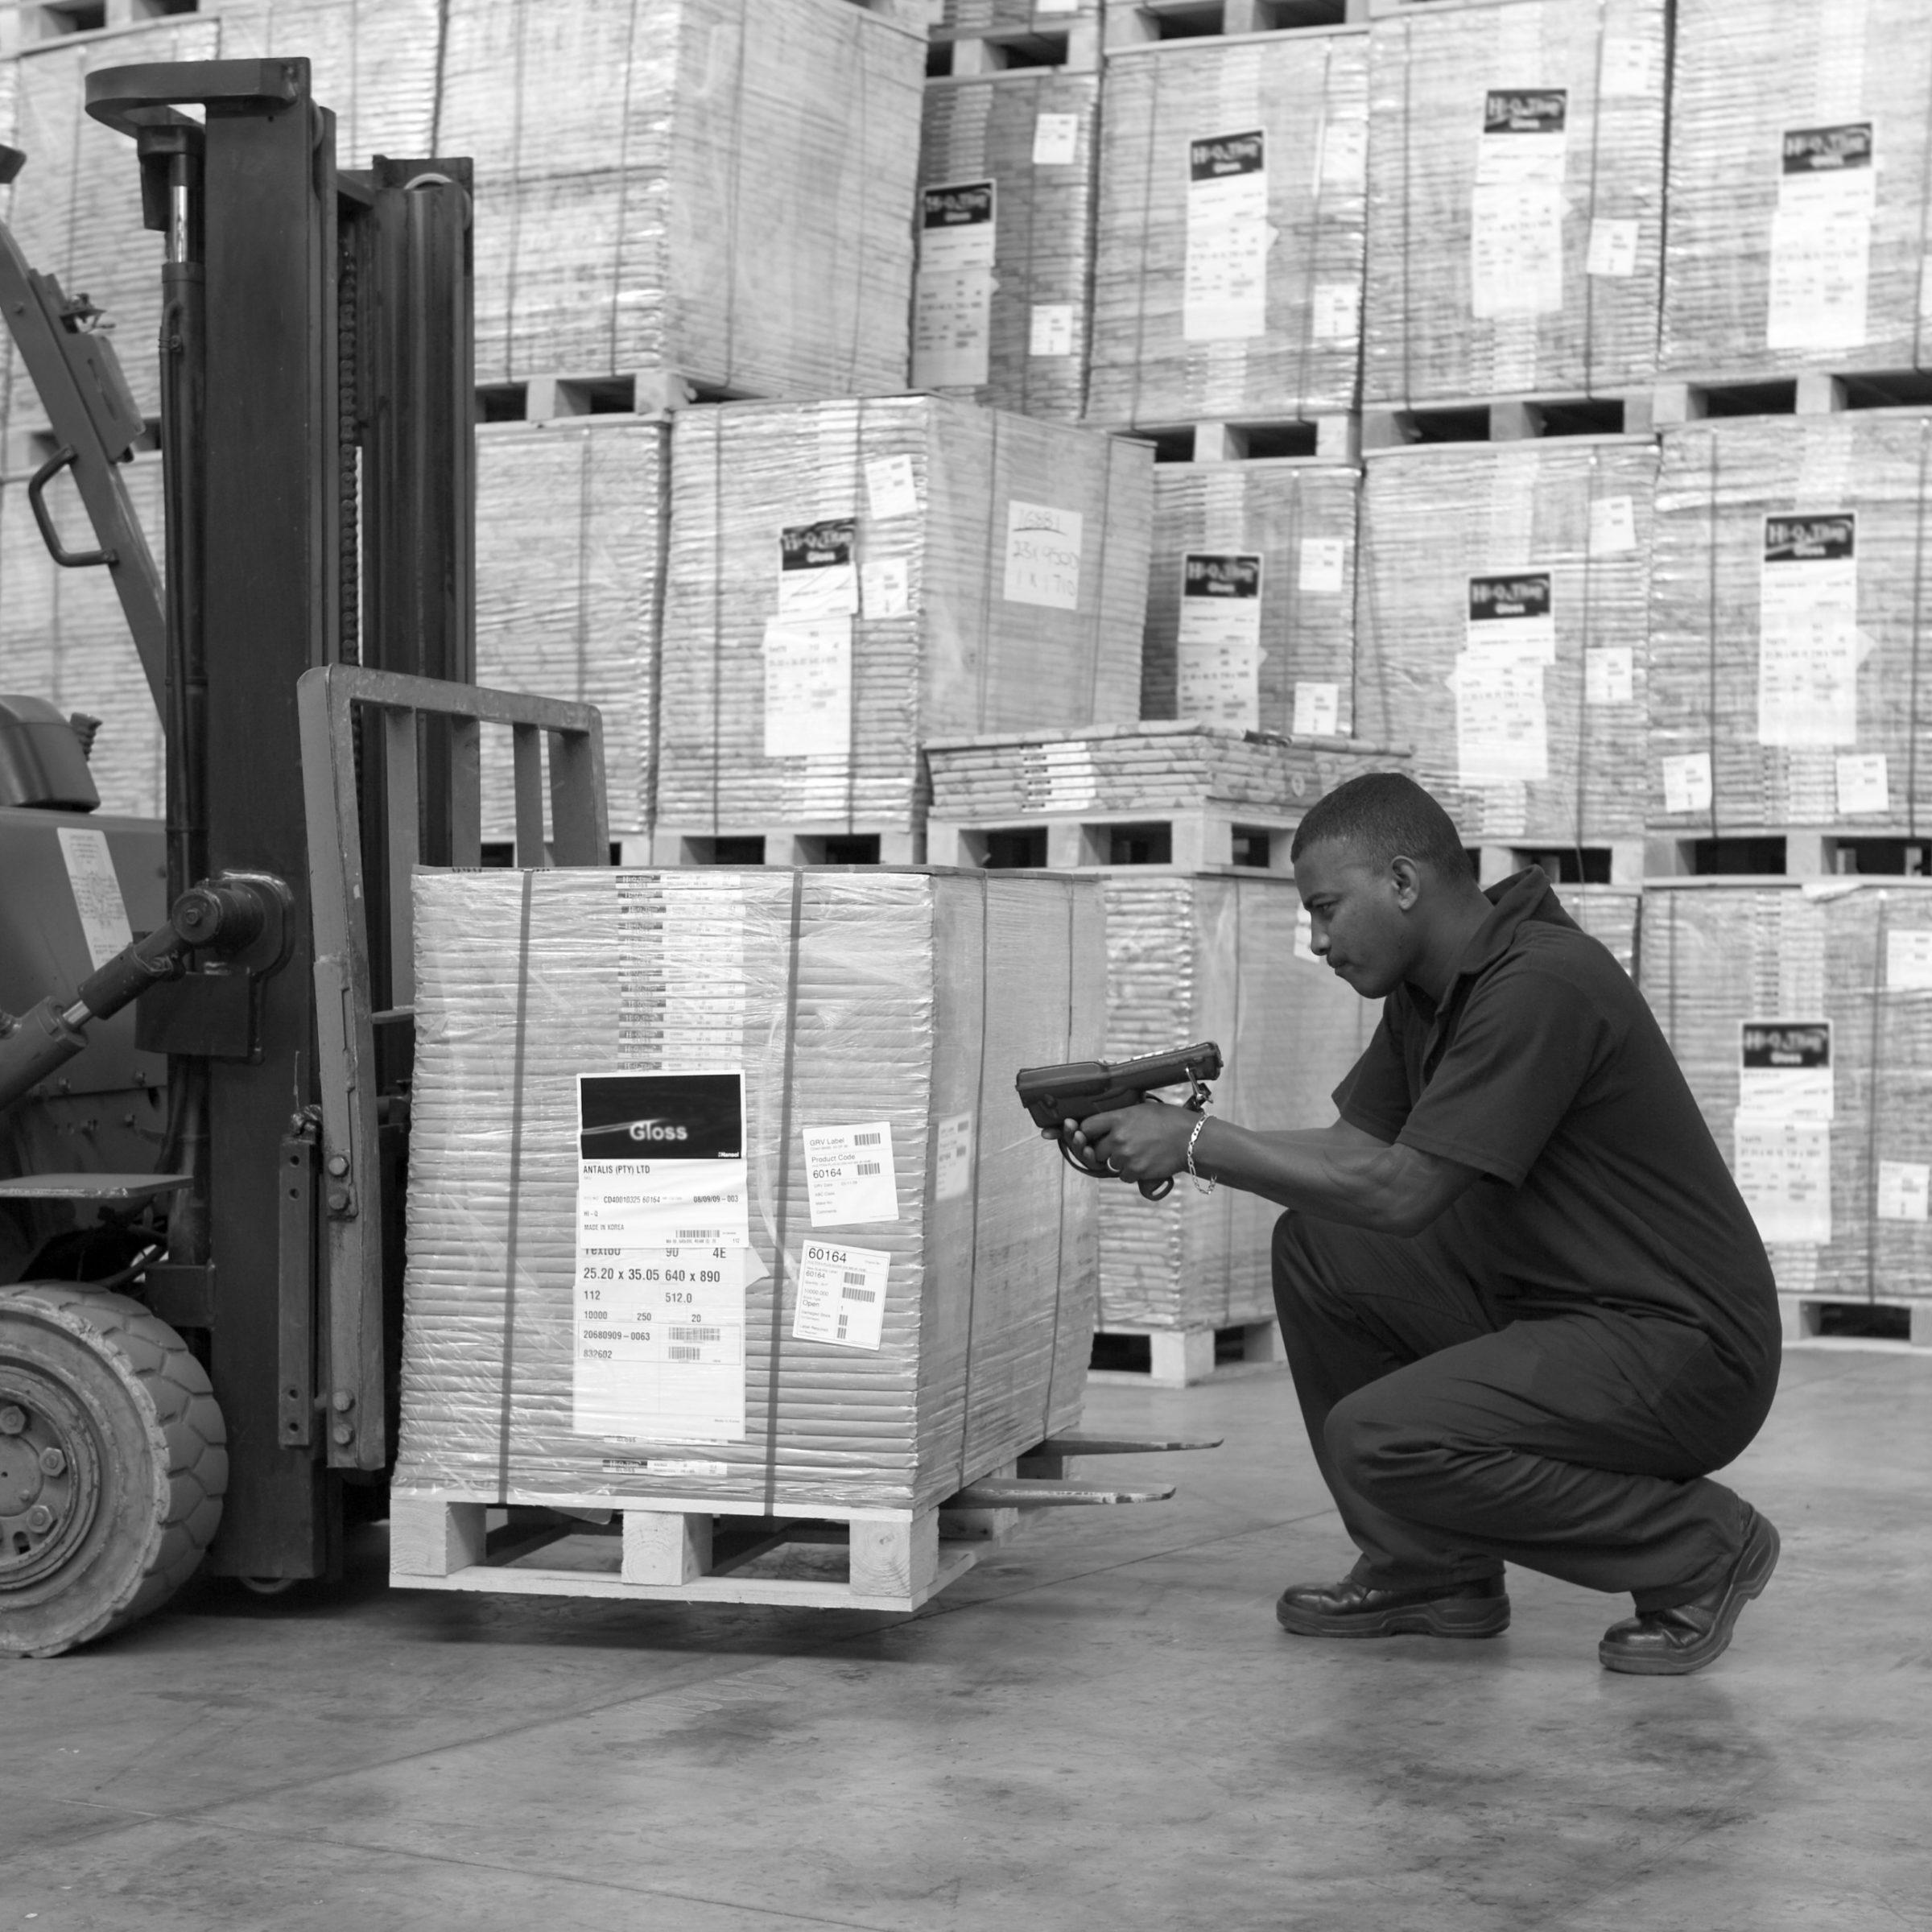 Man scanning pallet in warehouse